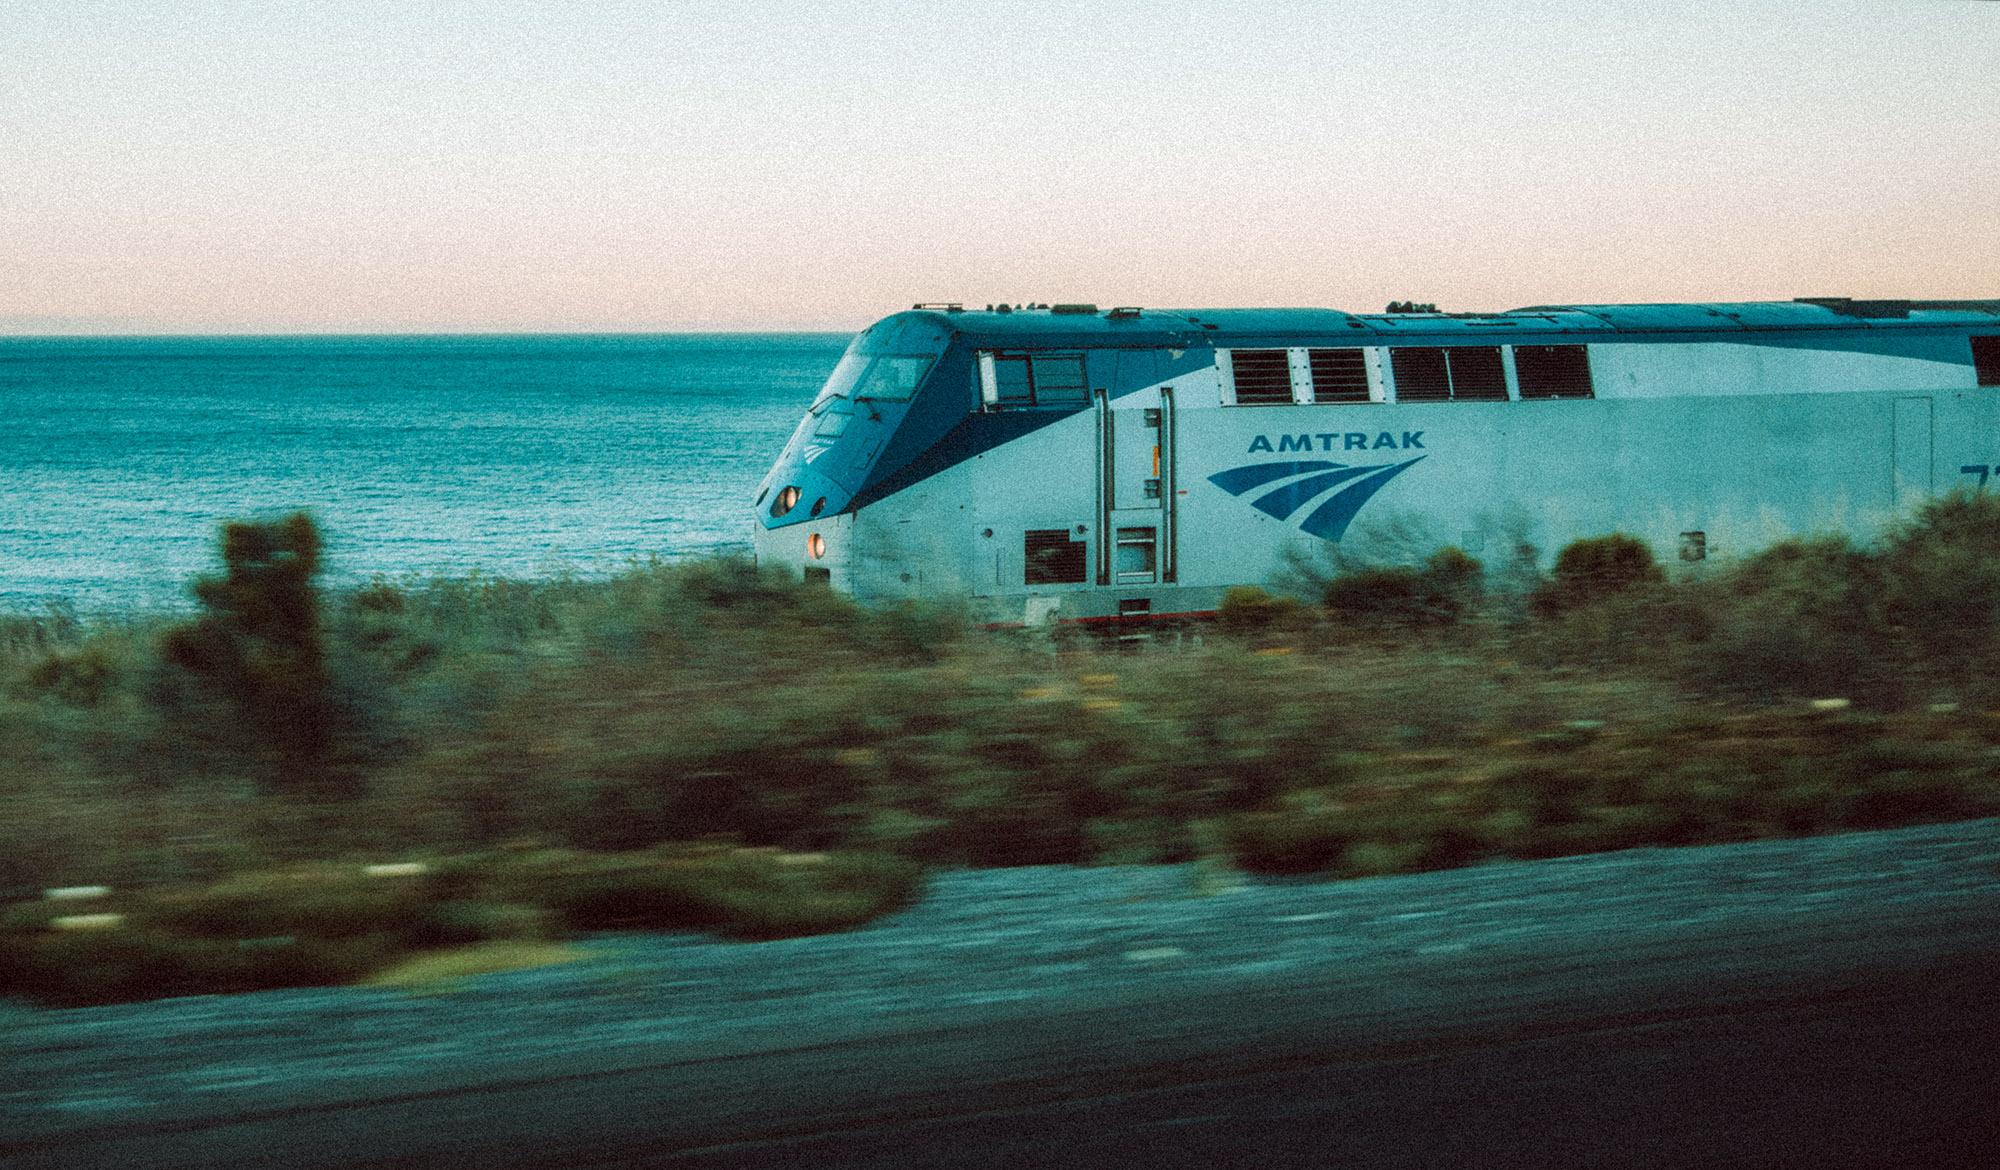 Amtrak -